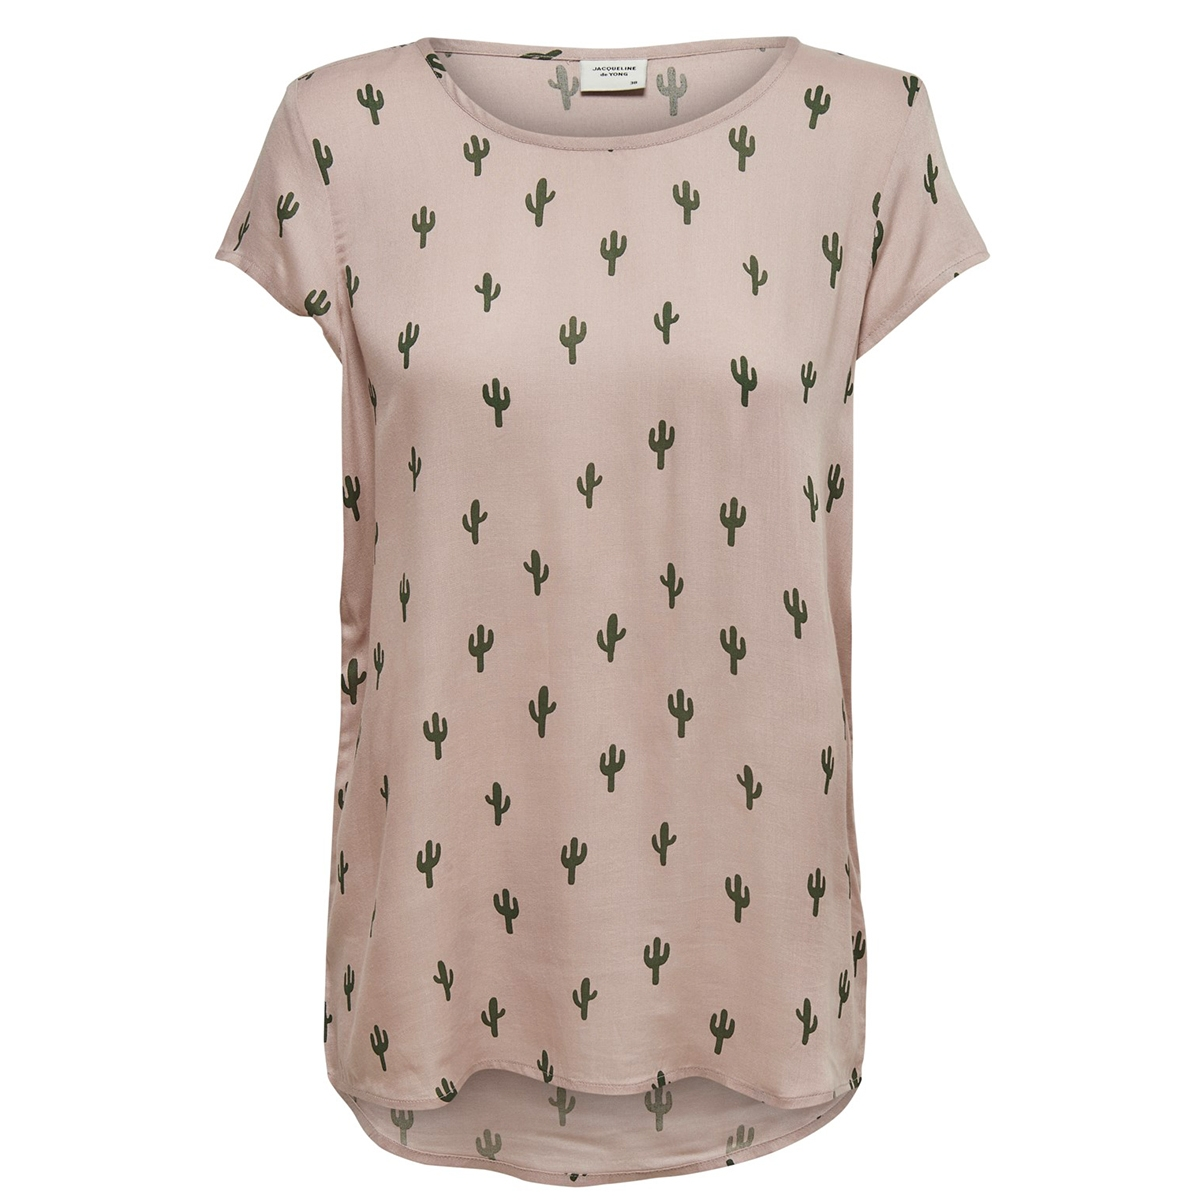 jdymarli s/s top wvn 15173944 jacqueline de yong t-shirt shadow gray/thyme cactus